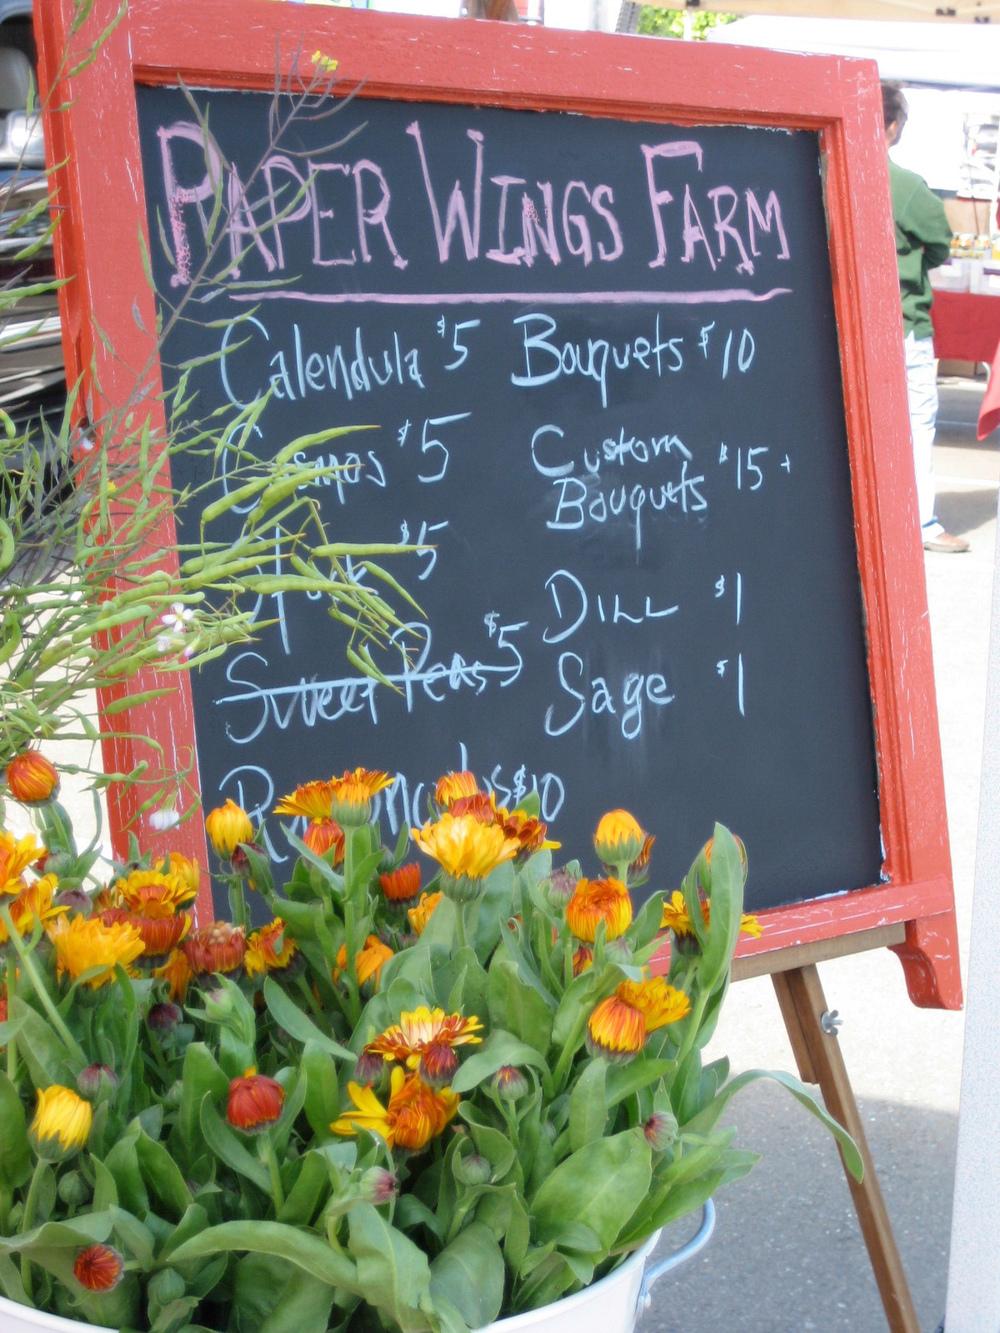 willschelsea-paperwingsfarm-8.jpg